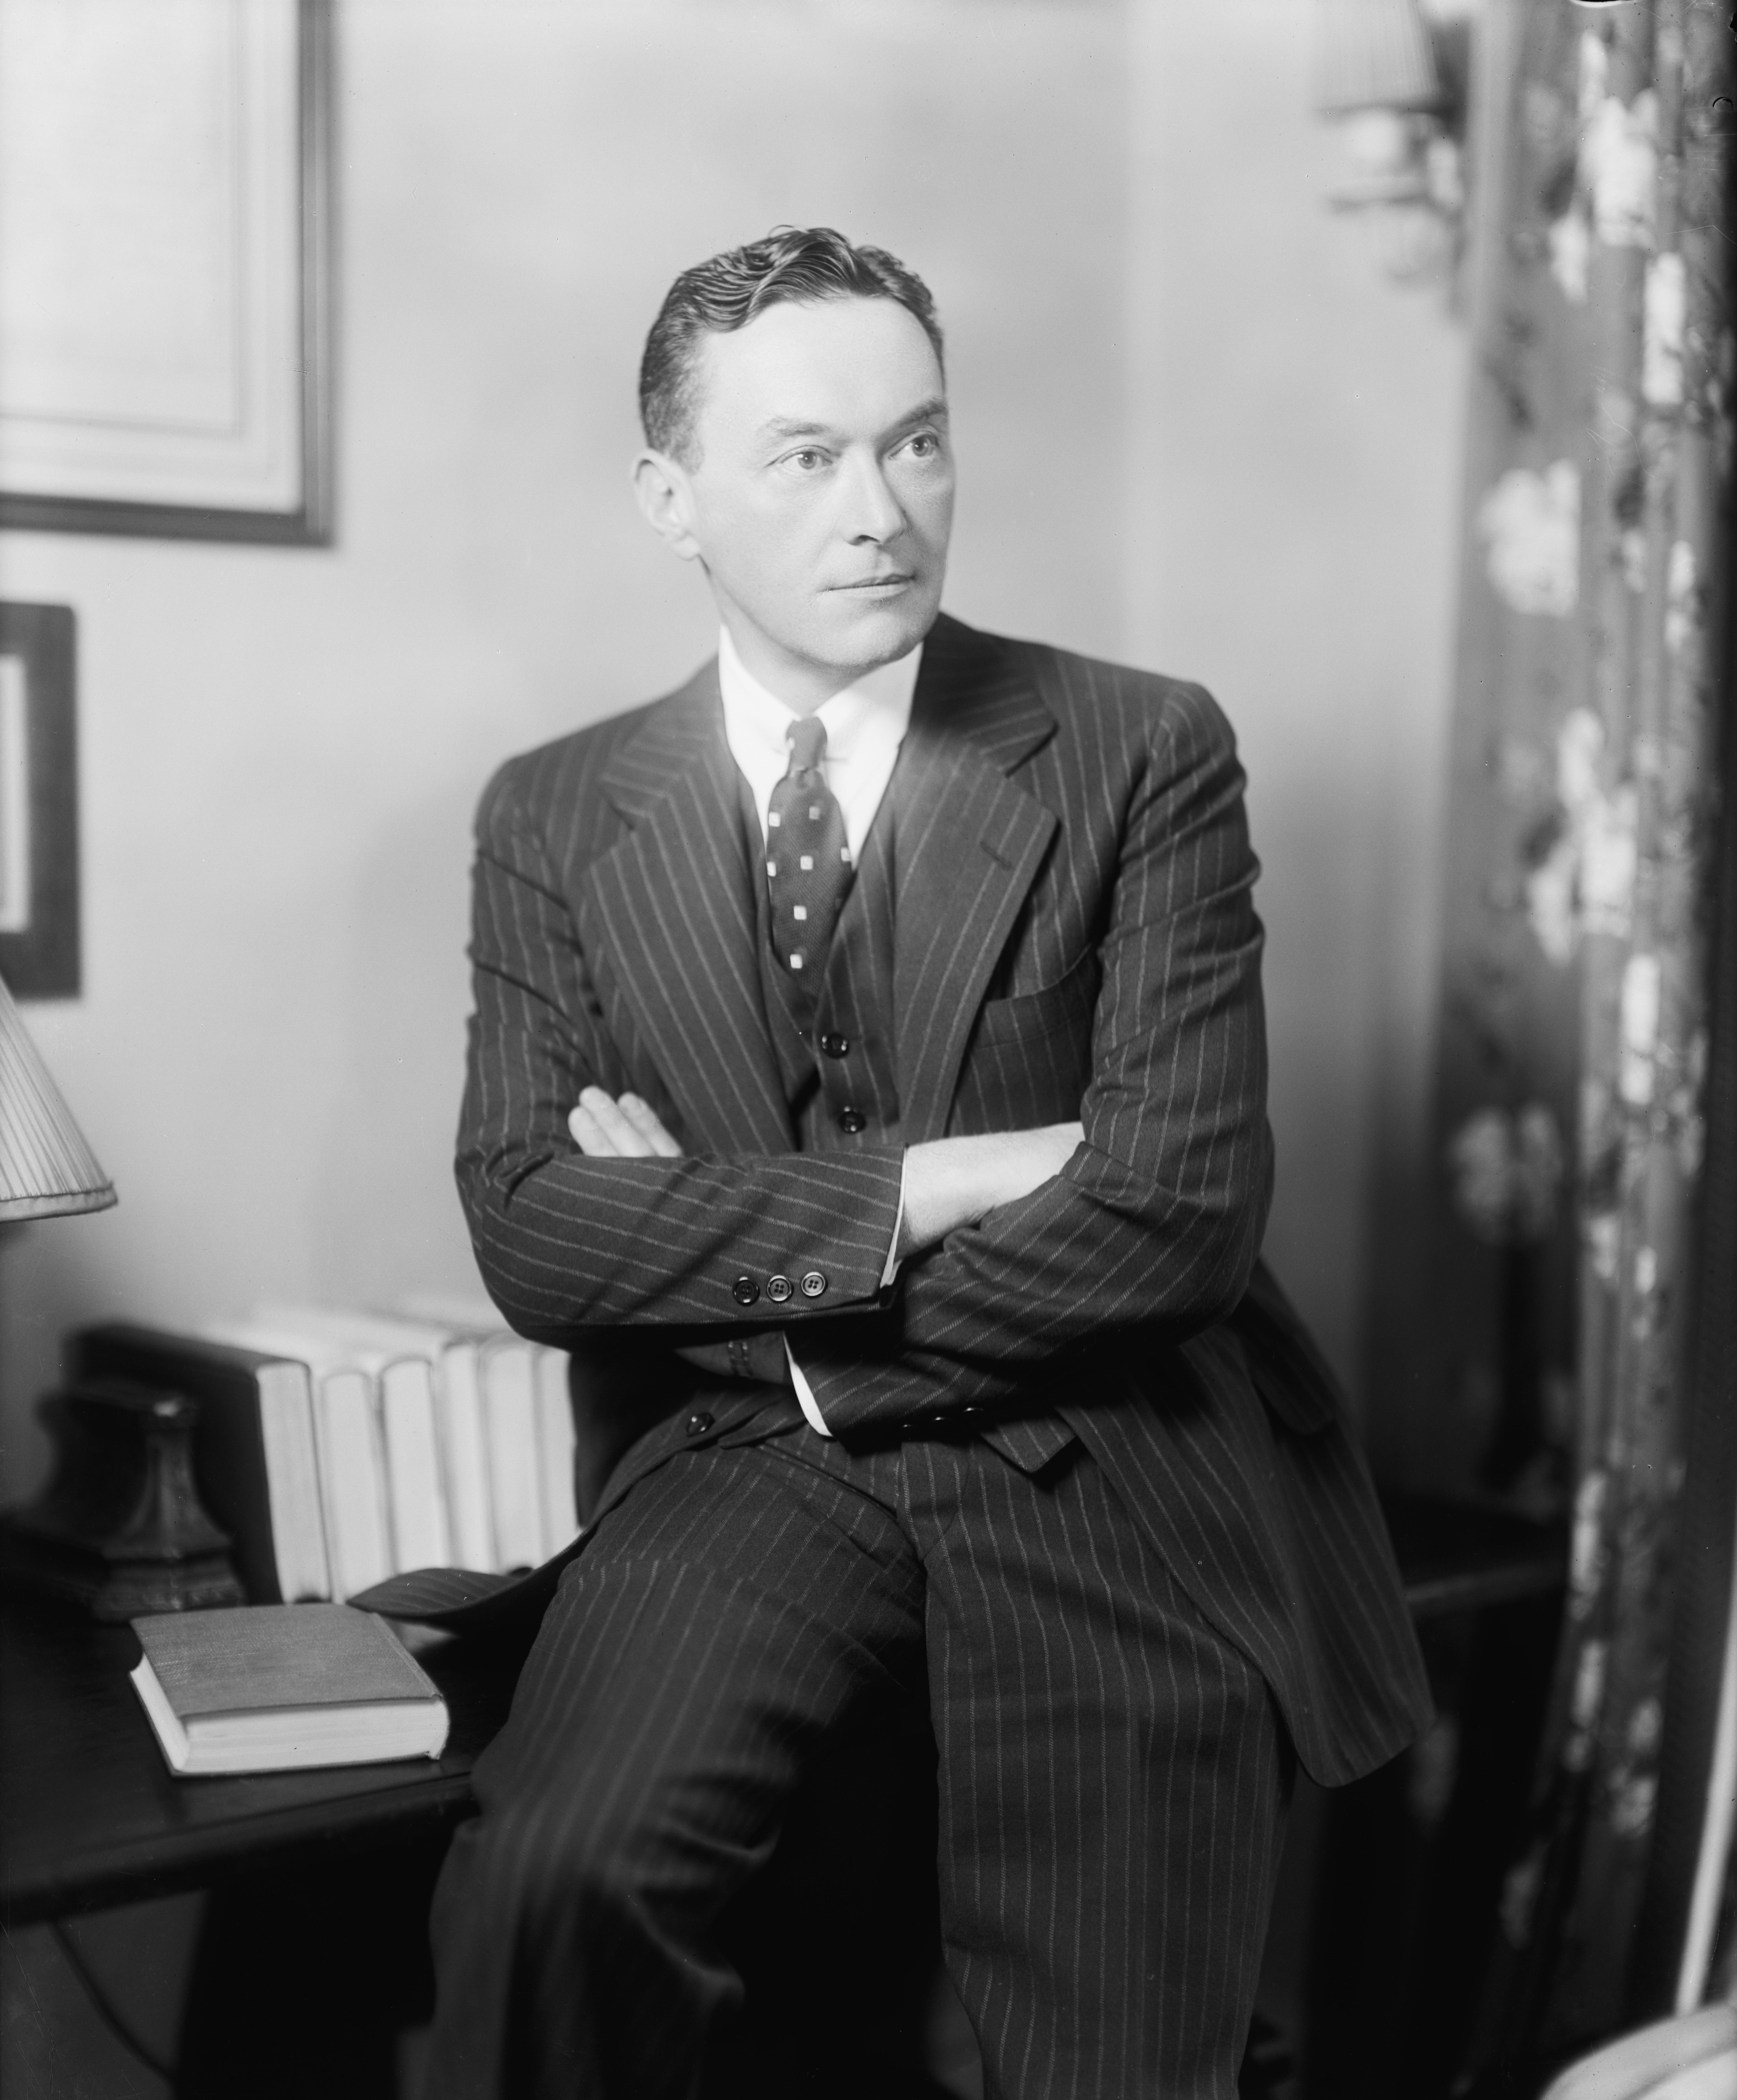 Lippmann, about 1920